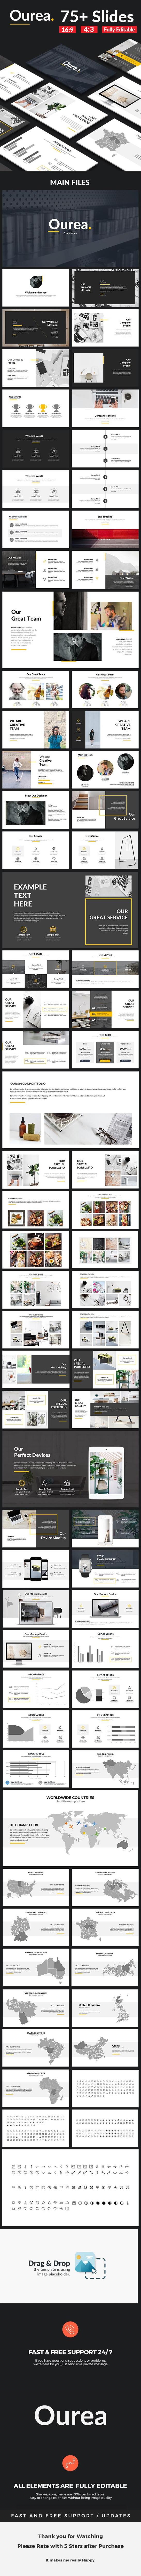 Ourea - Creative Google Slide Template - Google Slides Presentation Templates